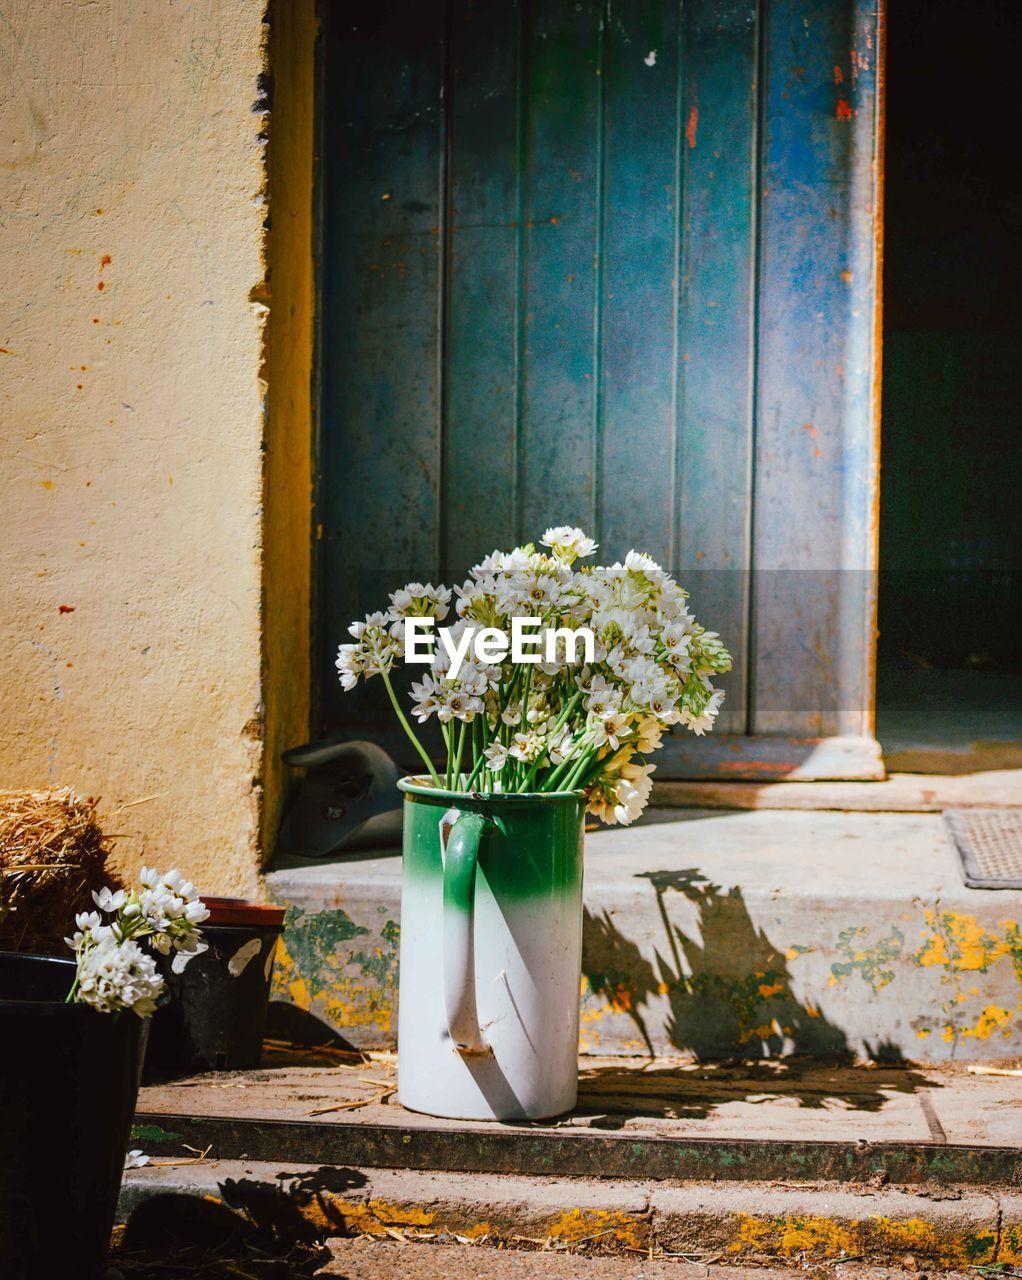 Low Ange View Of Flowers In Jug By Door